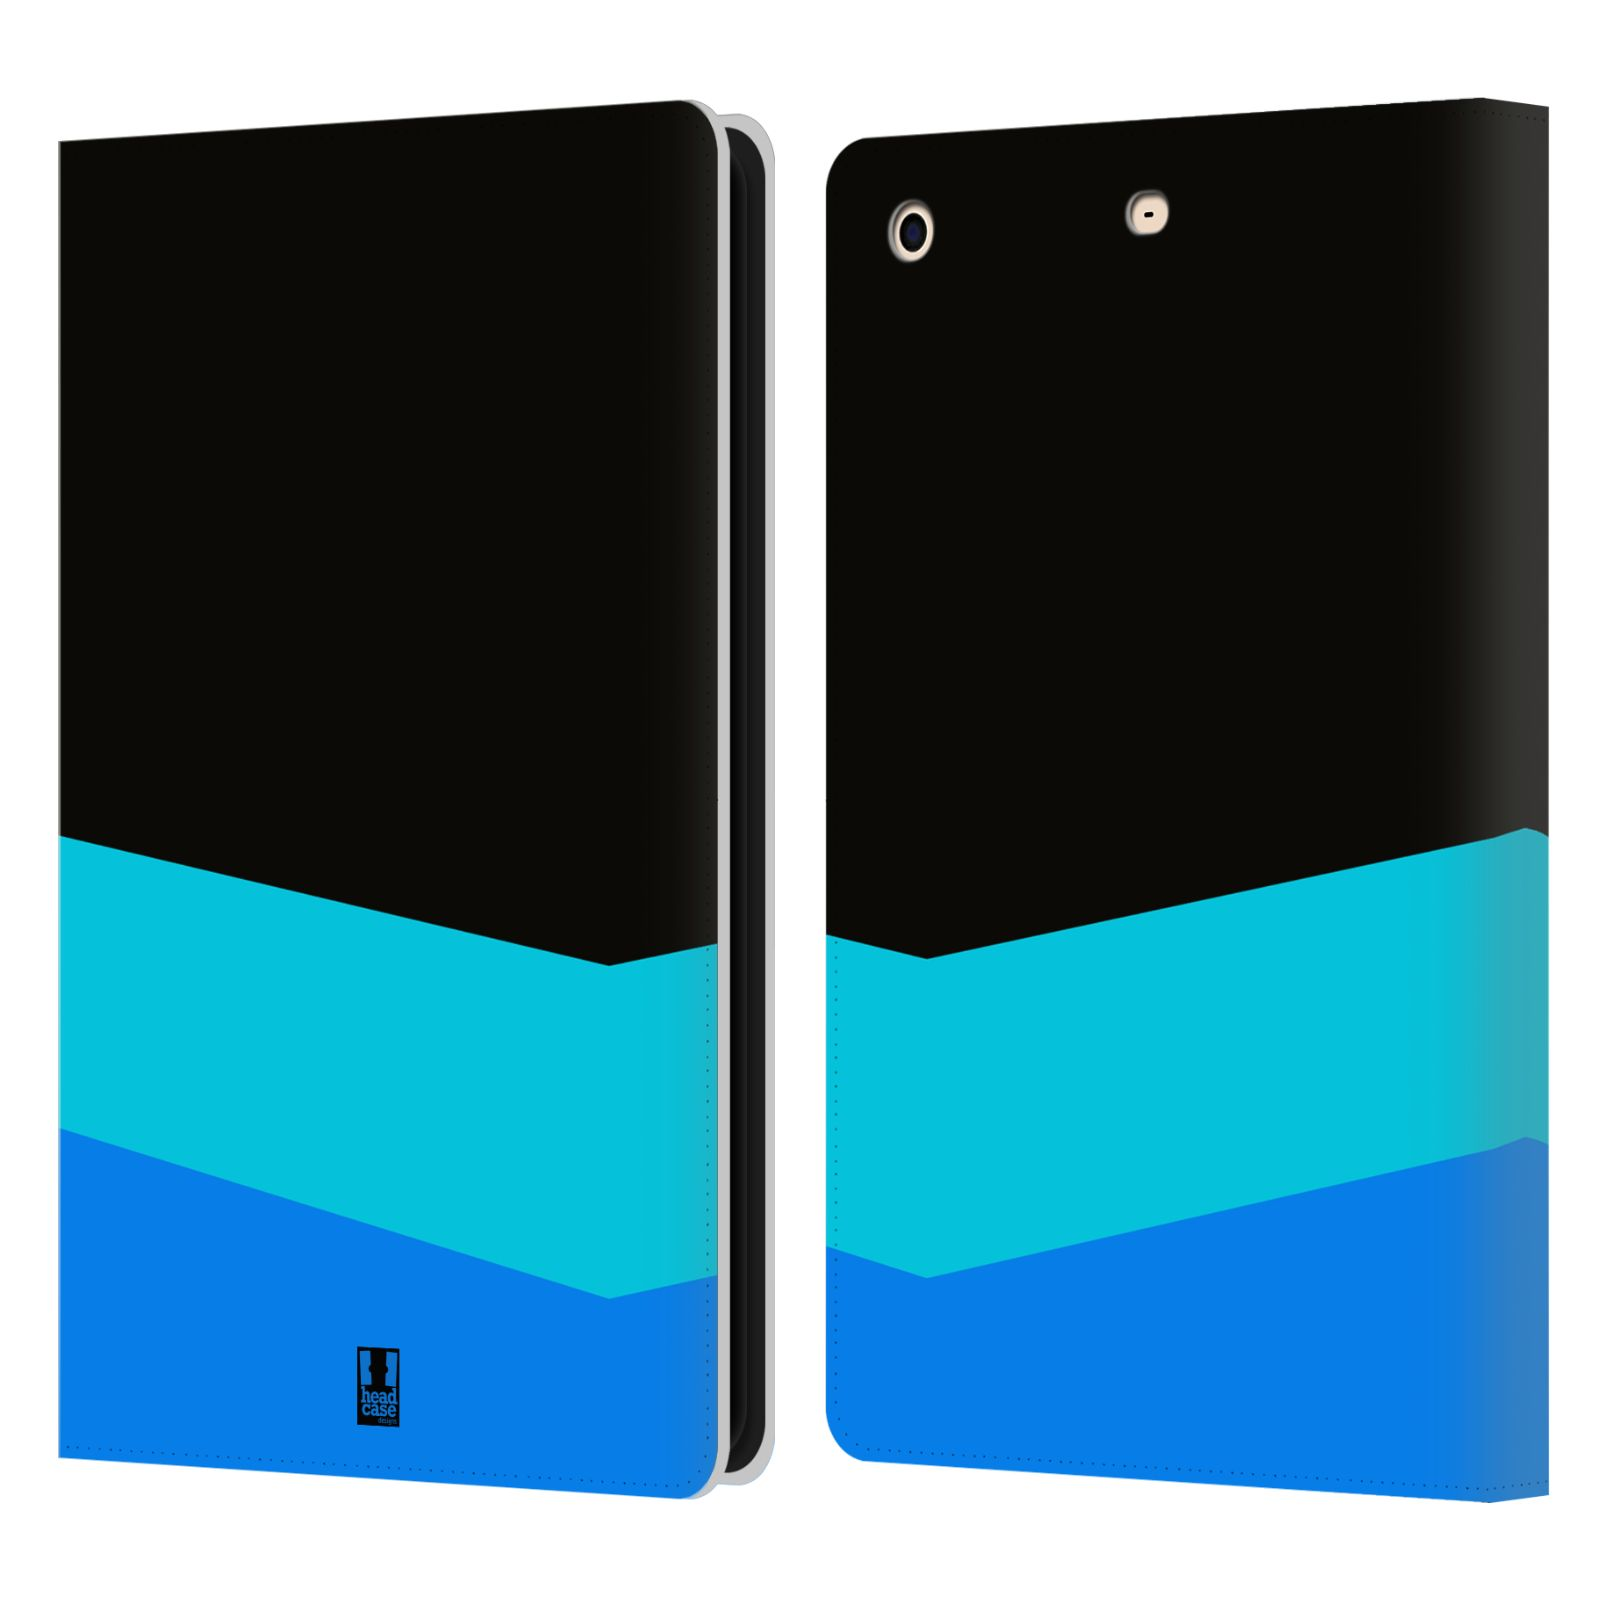 HEAD CASE Flipové pouzdro pro tablet Apple iPad mini barevné tvary modrá a černá FORMAL